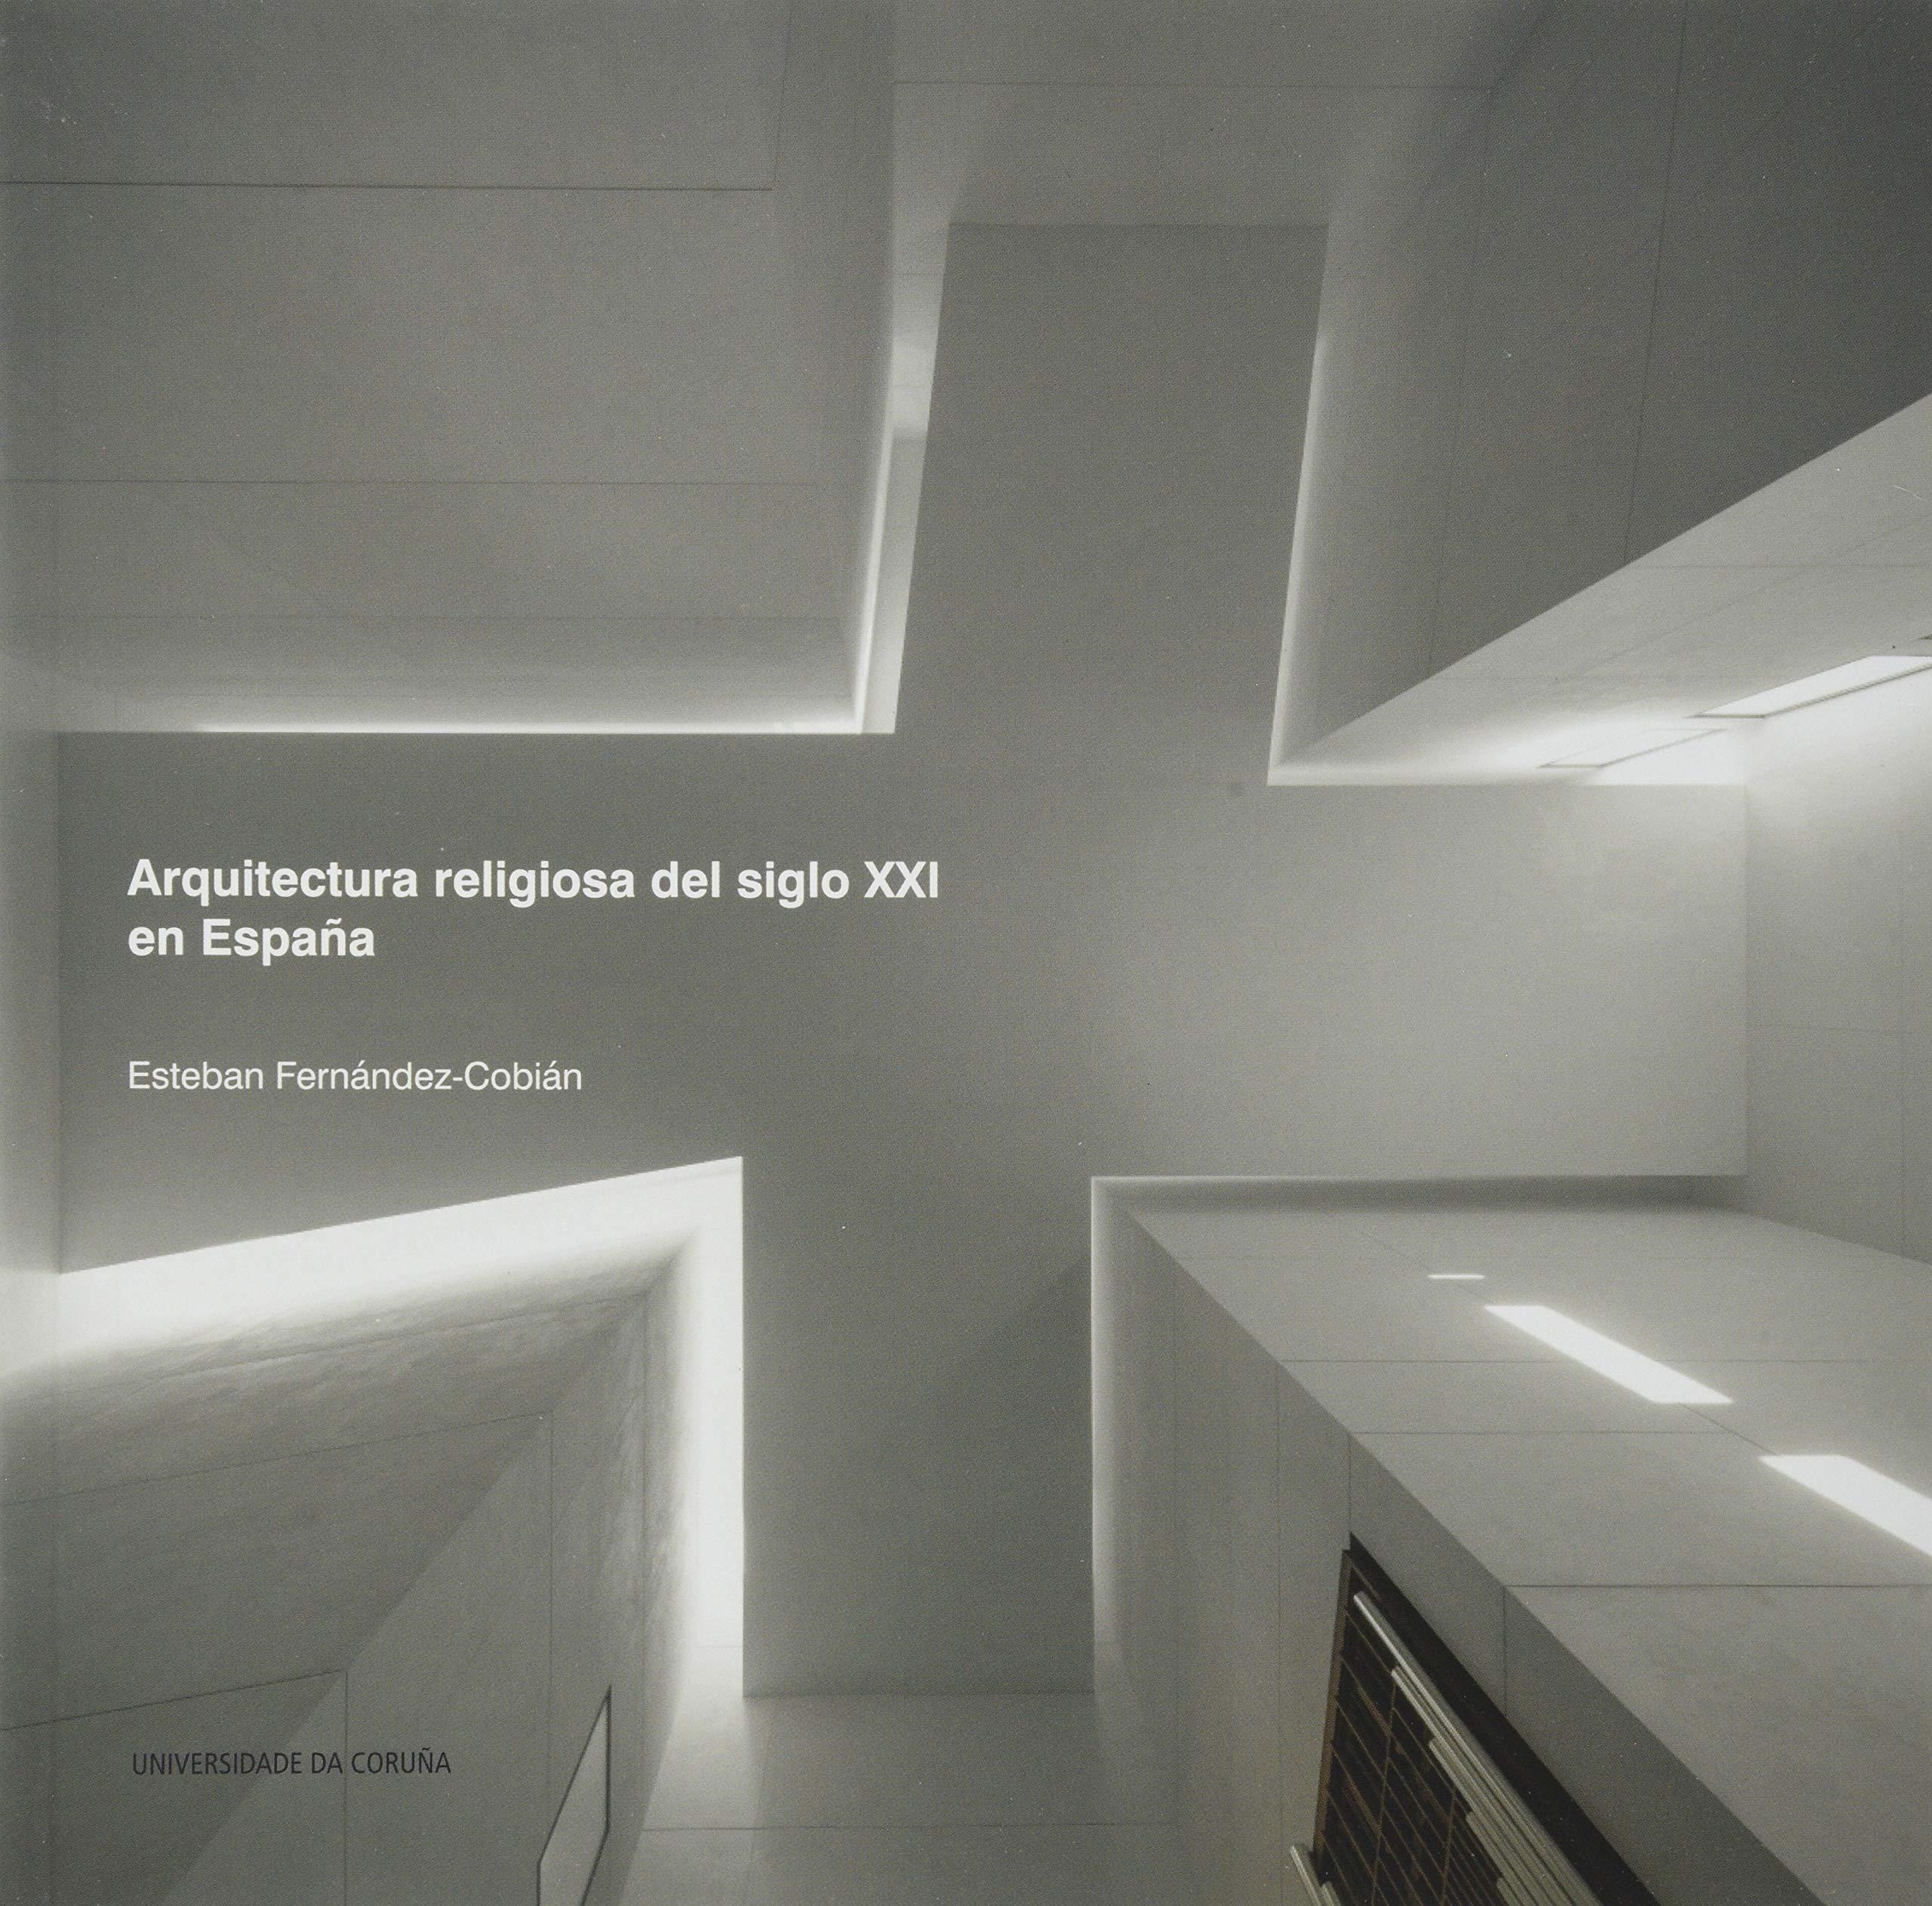 Arquitectura religiosa del siglo XXI en España: 164 Monografías: Amazon.es: Fernández-Cobián, Esteban: Libros